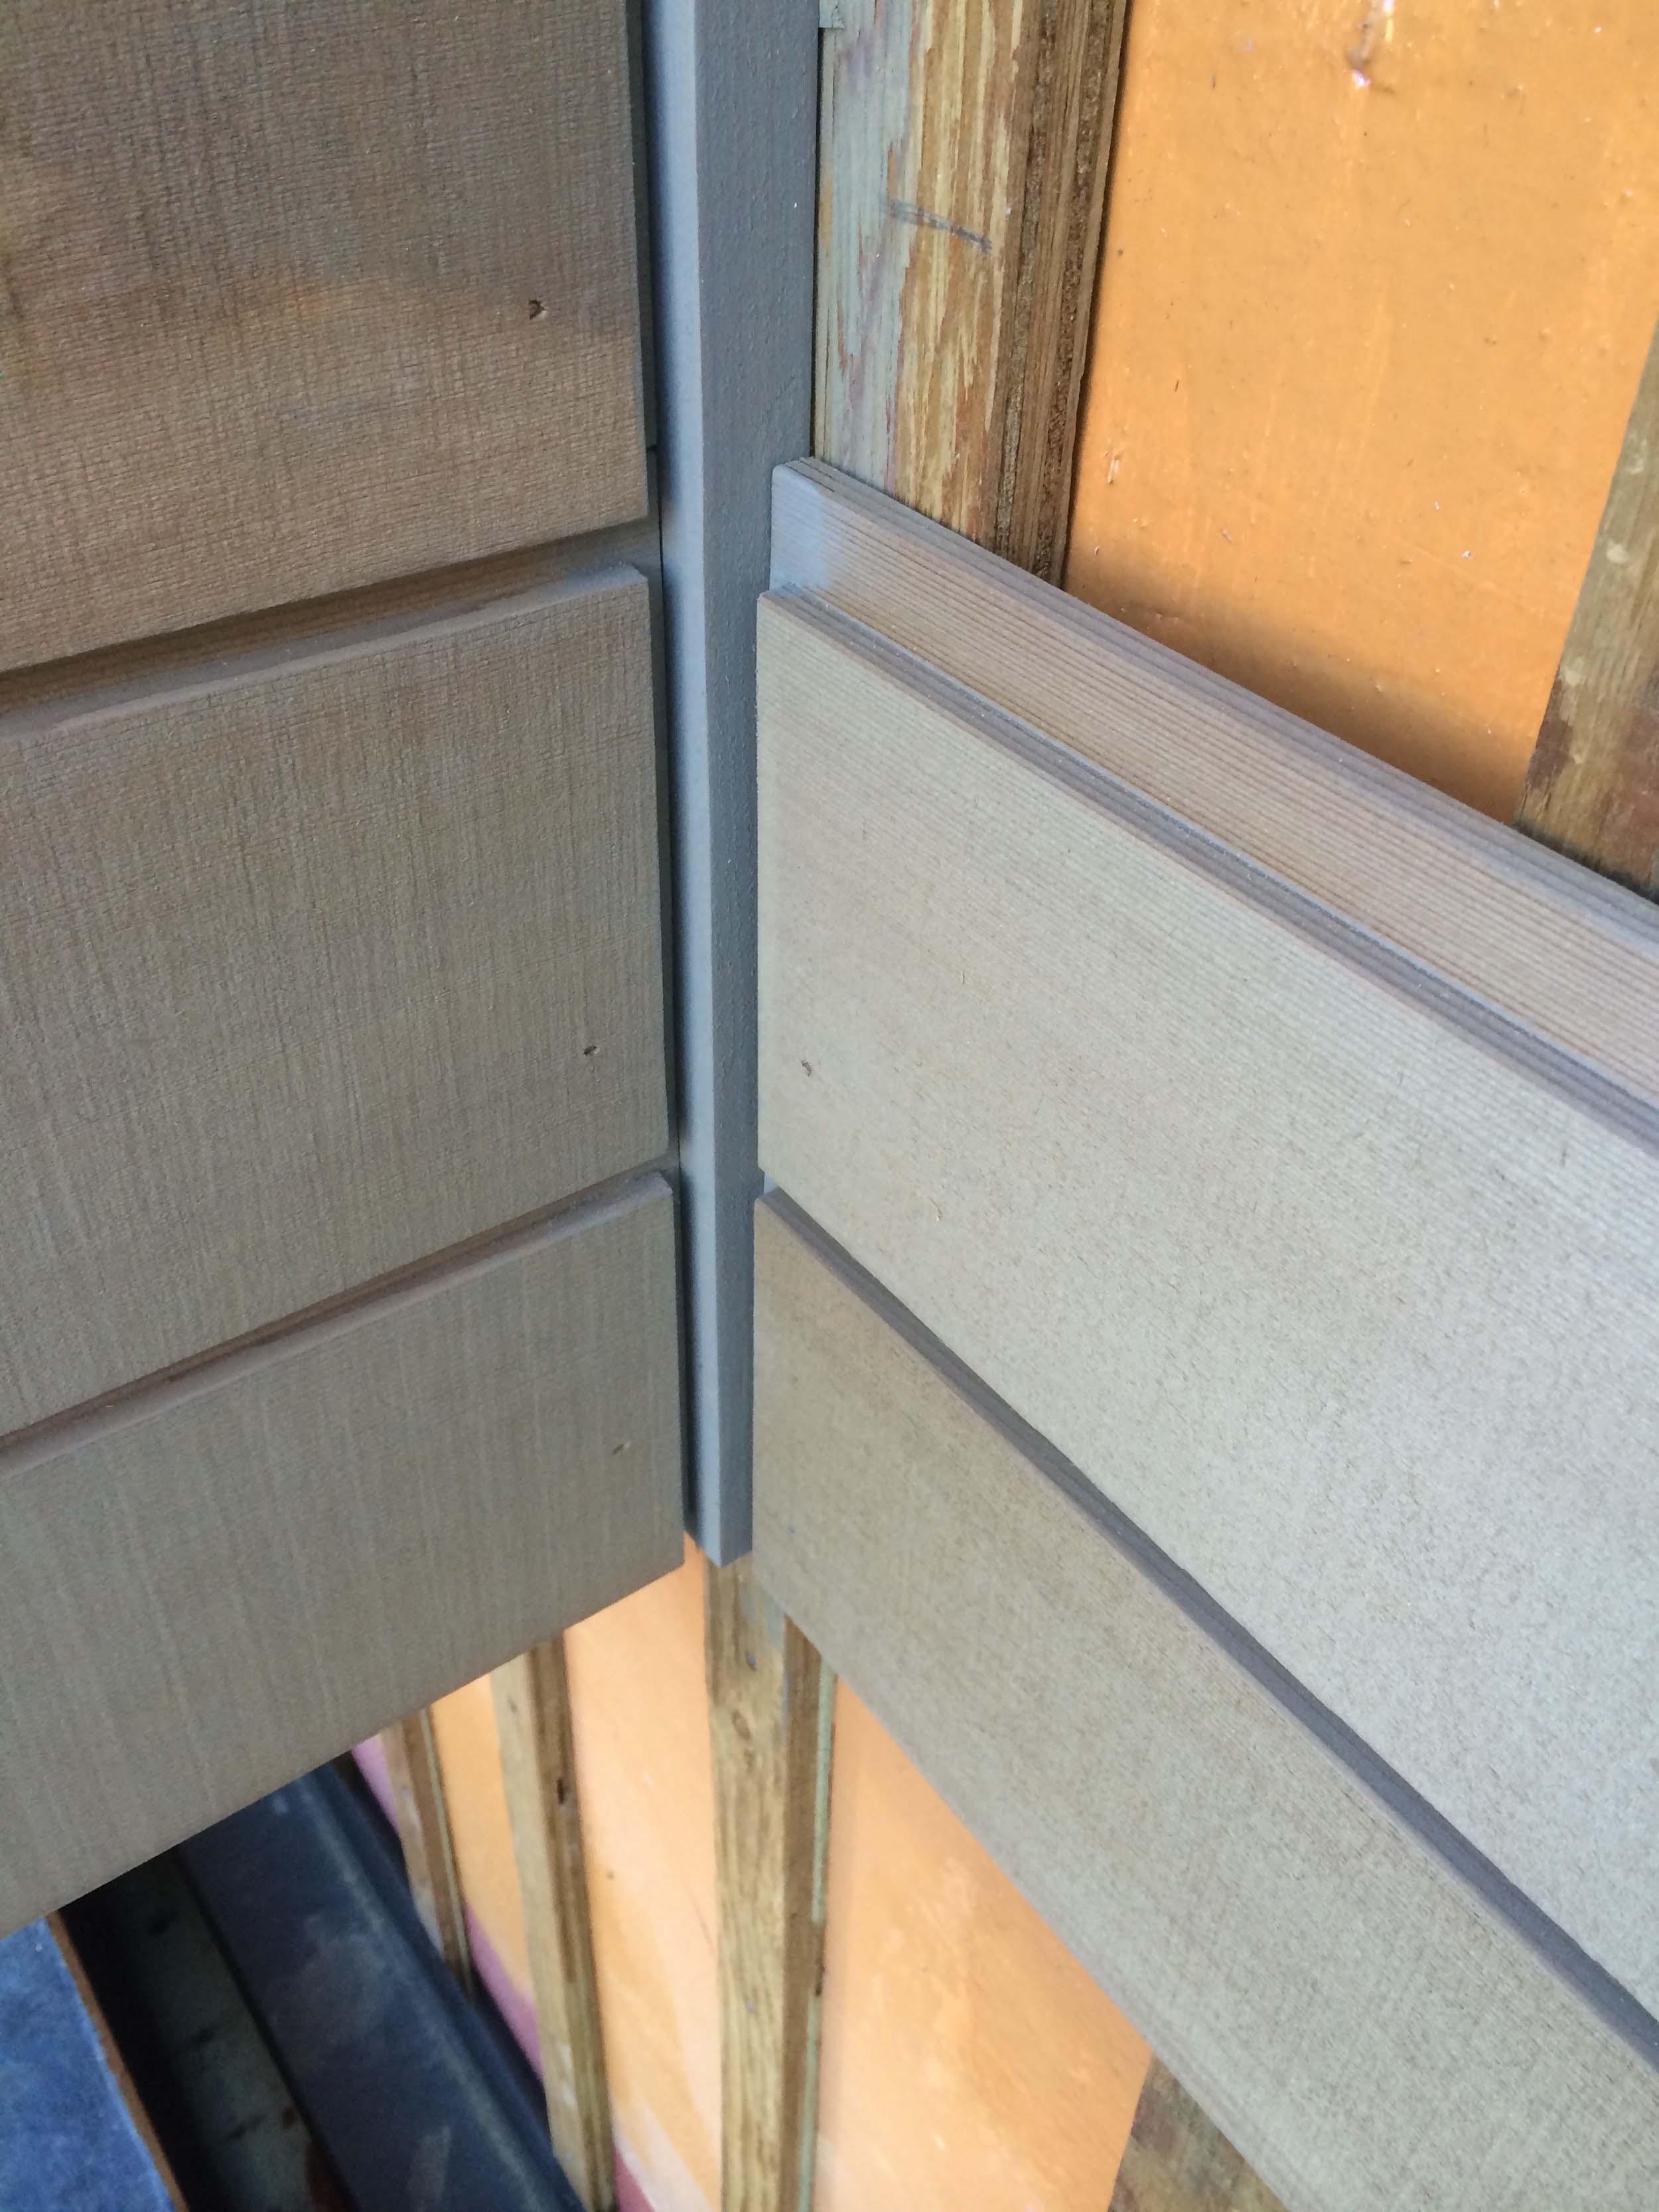 Postle_Construction_ExteriorCladding10.jpg